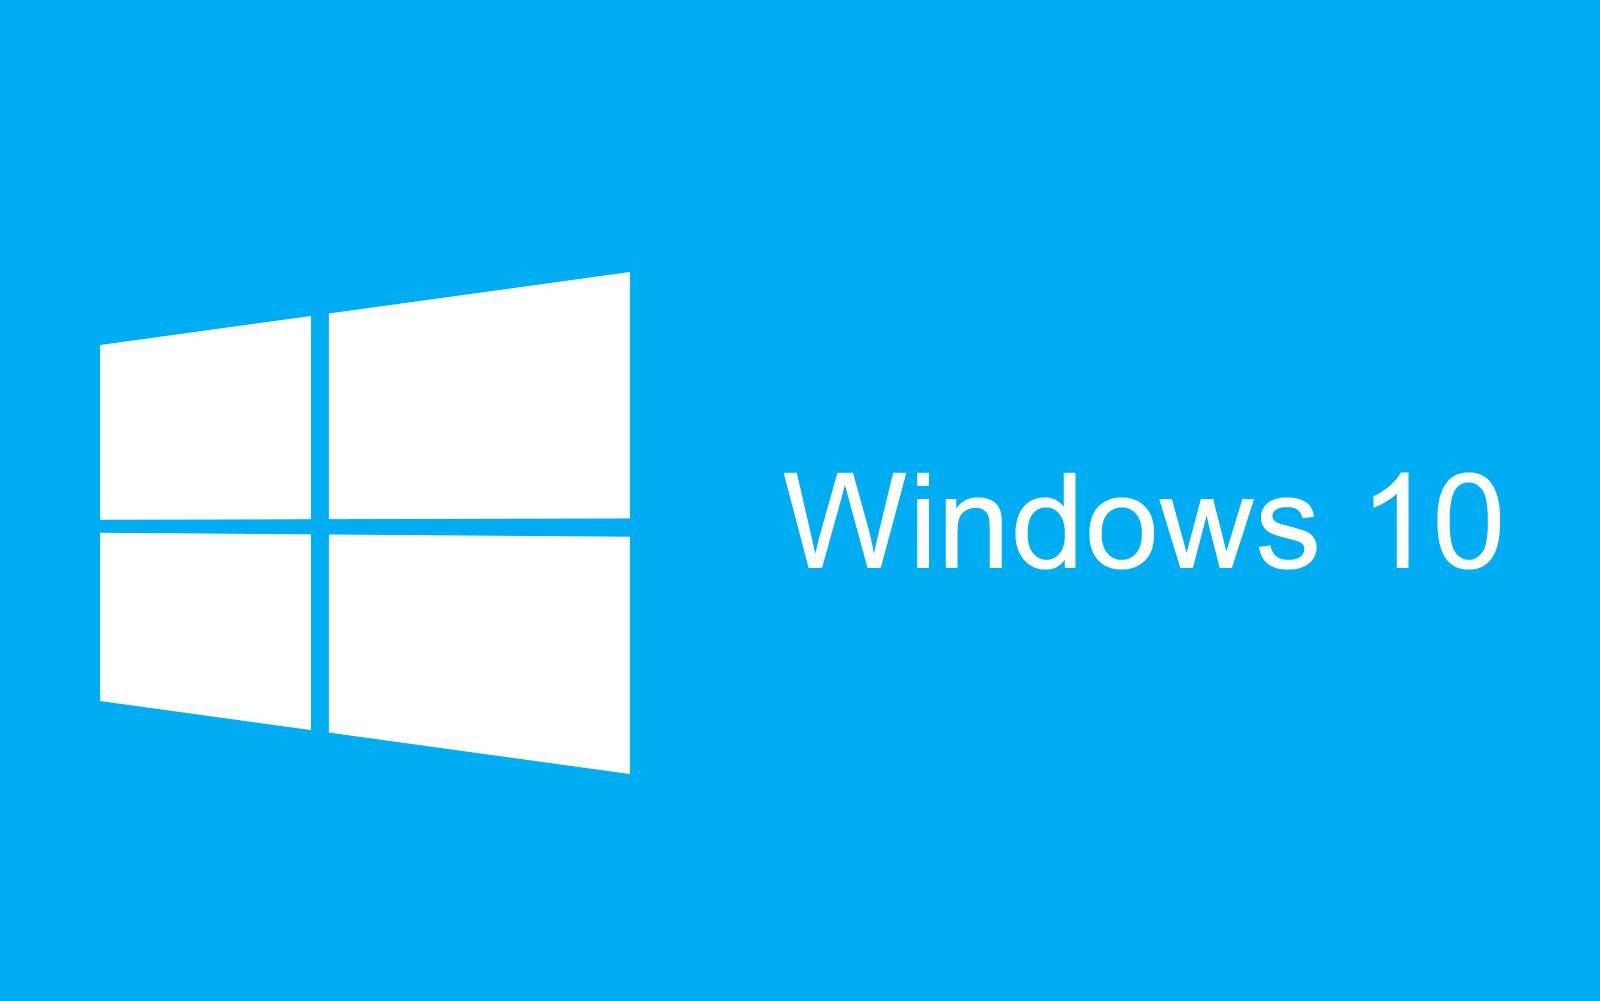 Europenii Lanseaza noi Acuzatii GRAVE IMPOTRIVA Windows 10